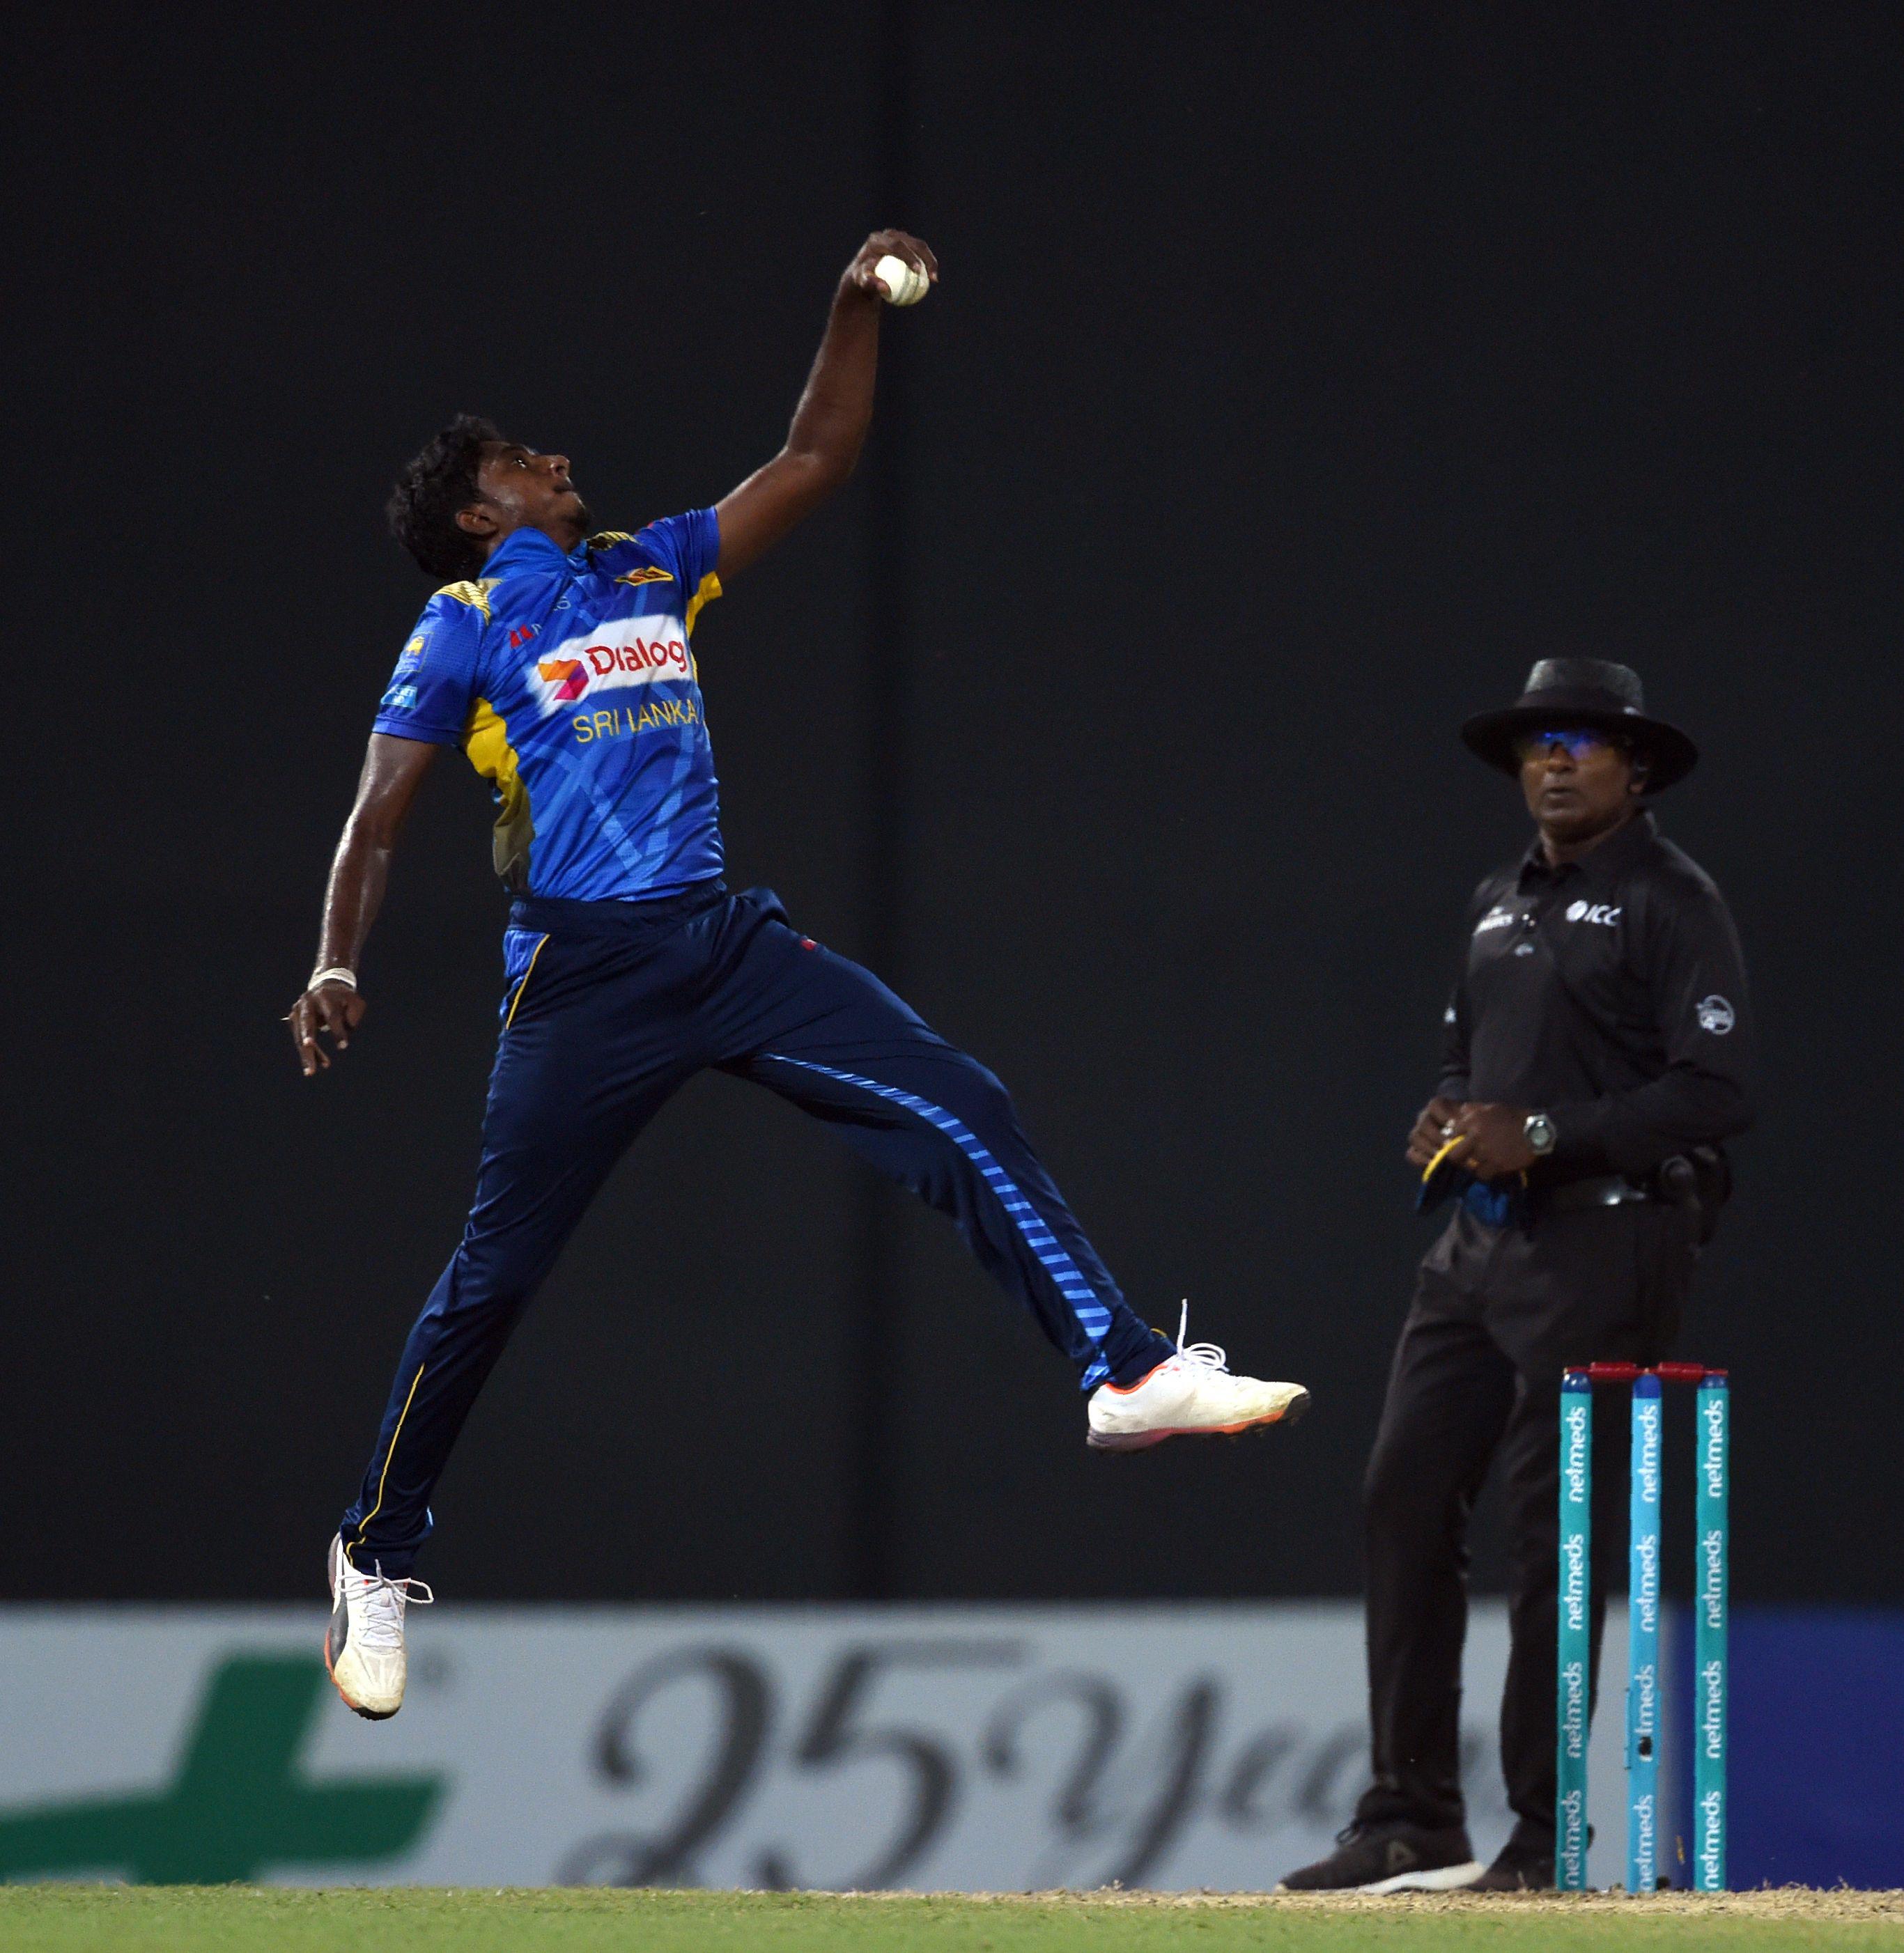 Sri Lankan cricketer Lakshan Sandakan stop ball during the international Twenty20 cricket match between Sri Lanka and England at the R. Peremadasa Stadium in Colombo on October 27, 2018. (Photo by ISHARA S. KODIKARA / AFP)